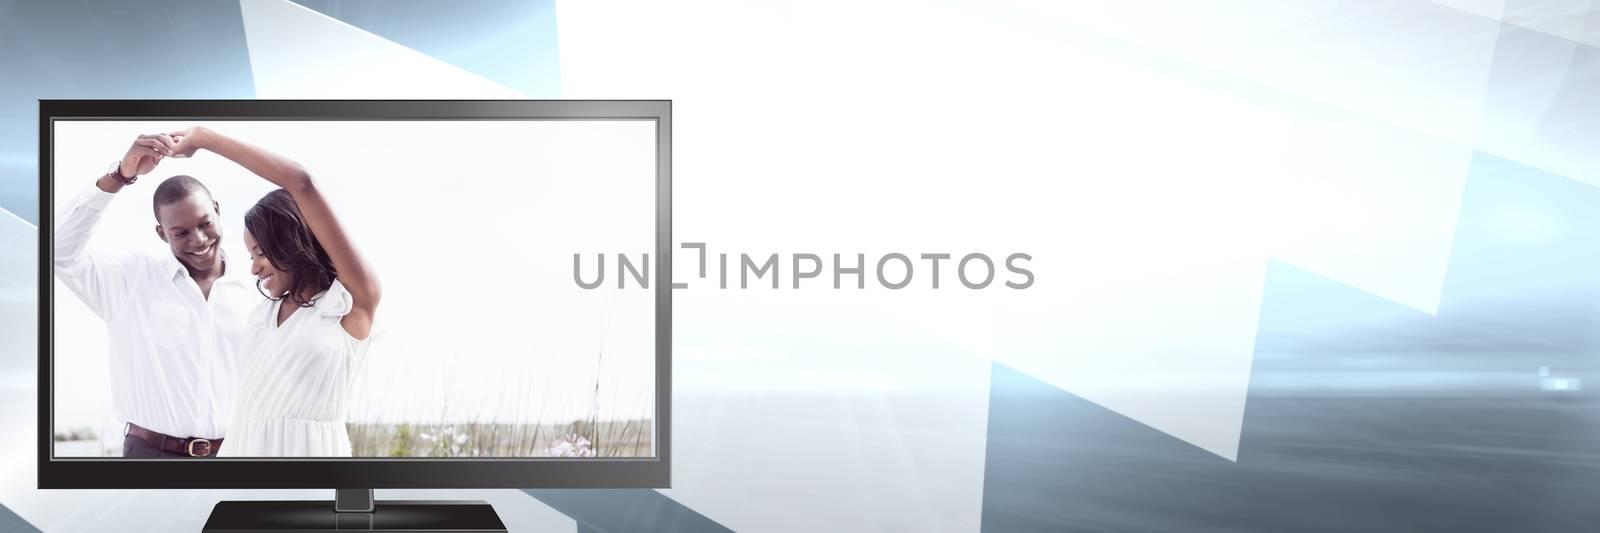 Digital composite of ROmantic couple on televisoin dancing